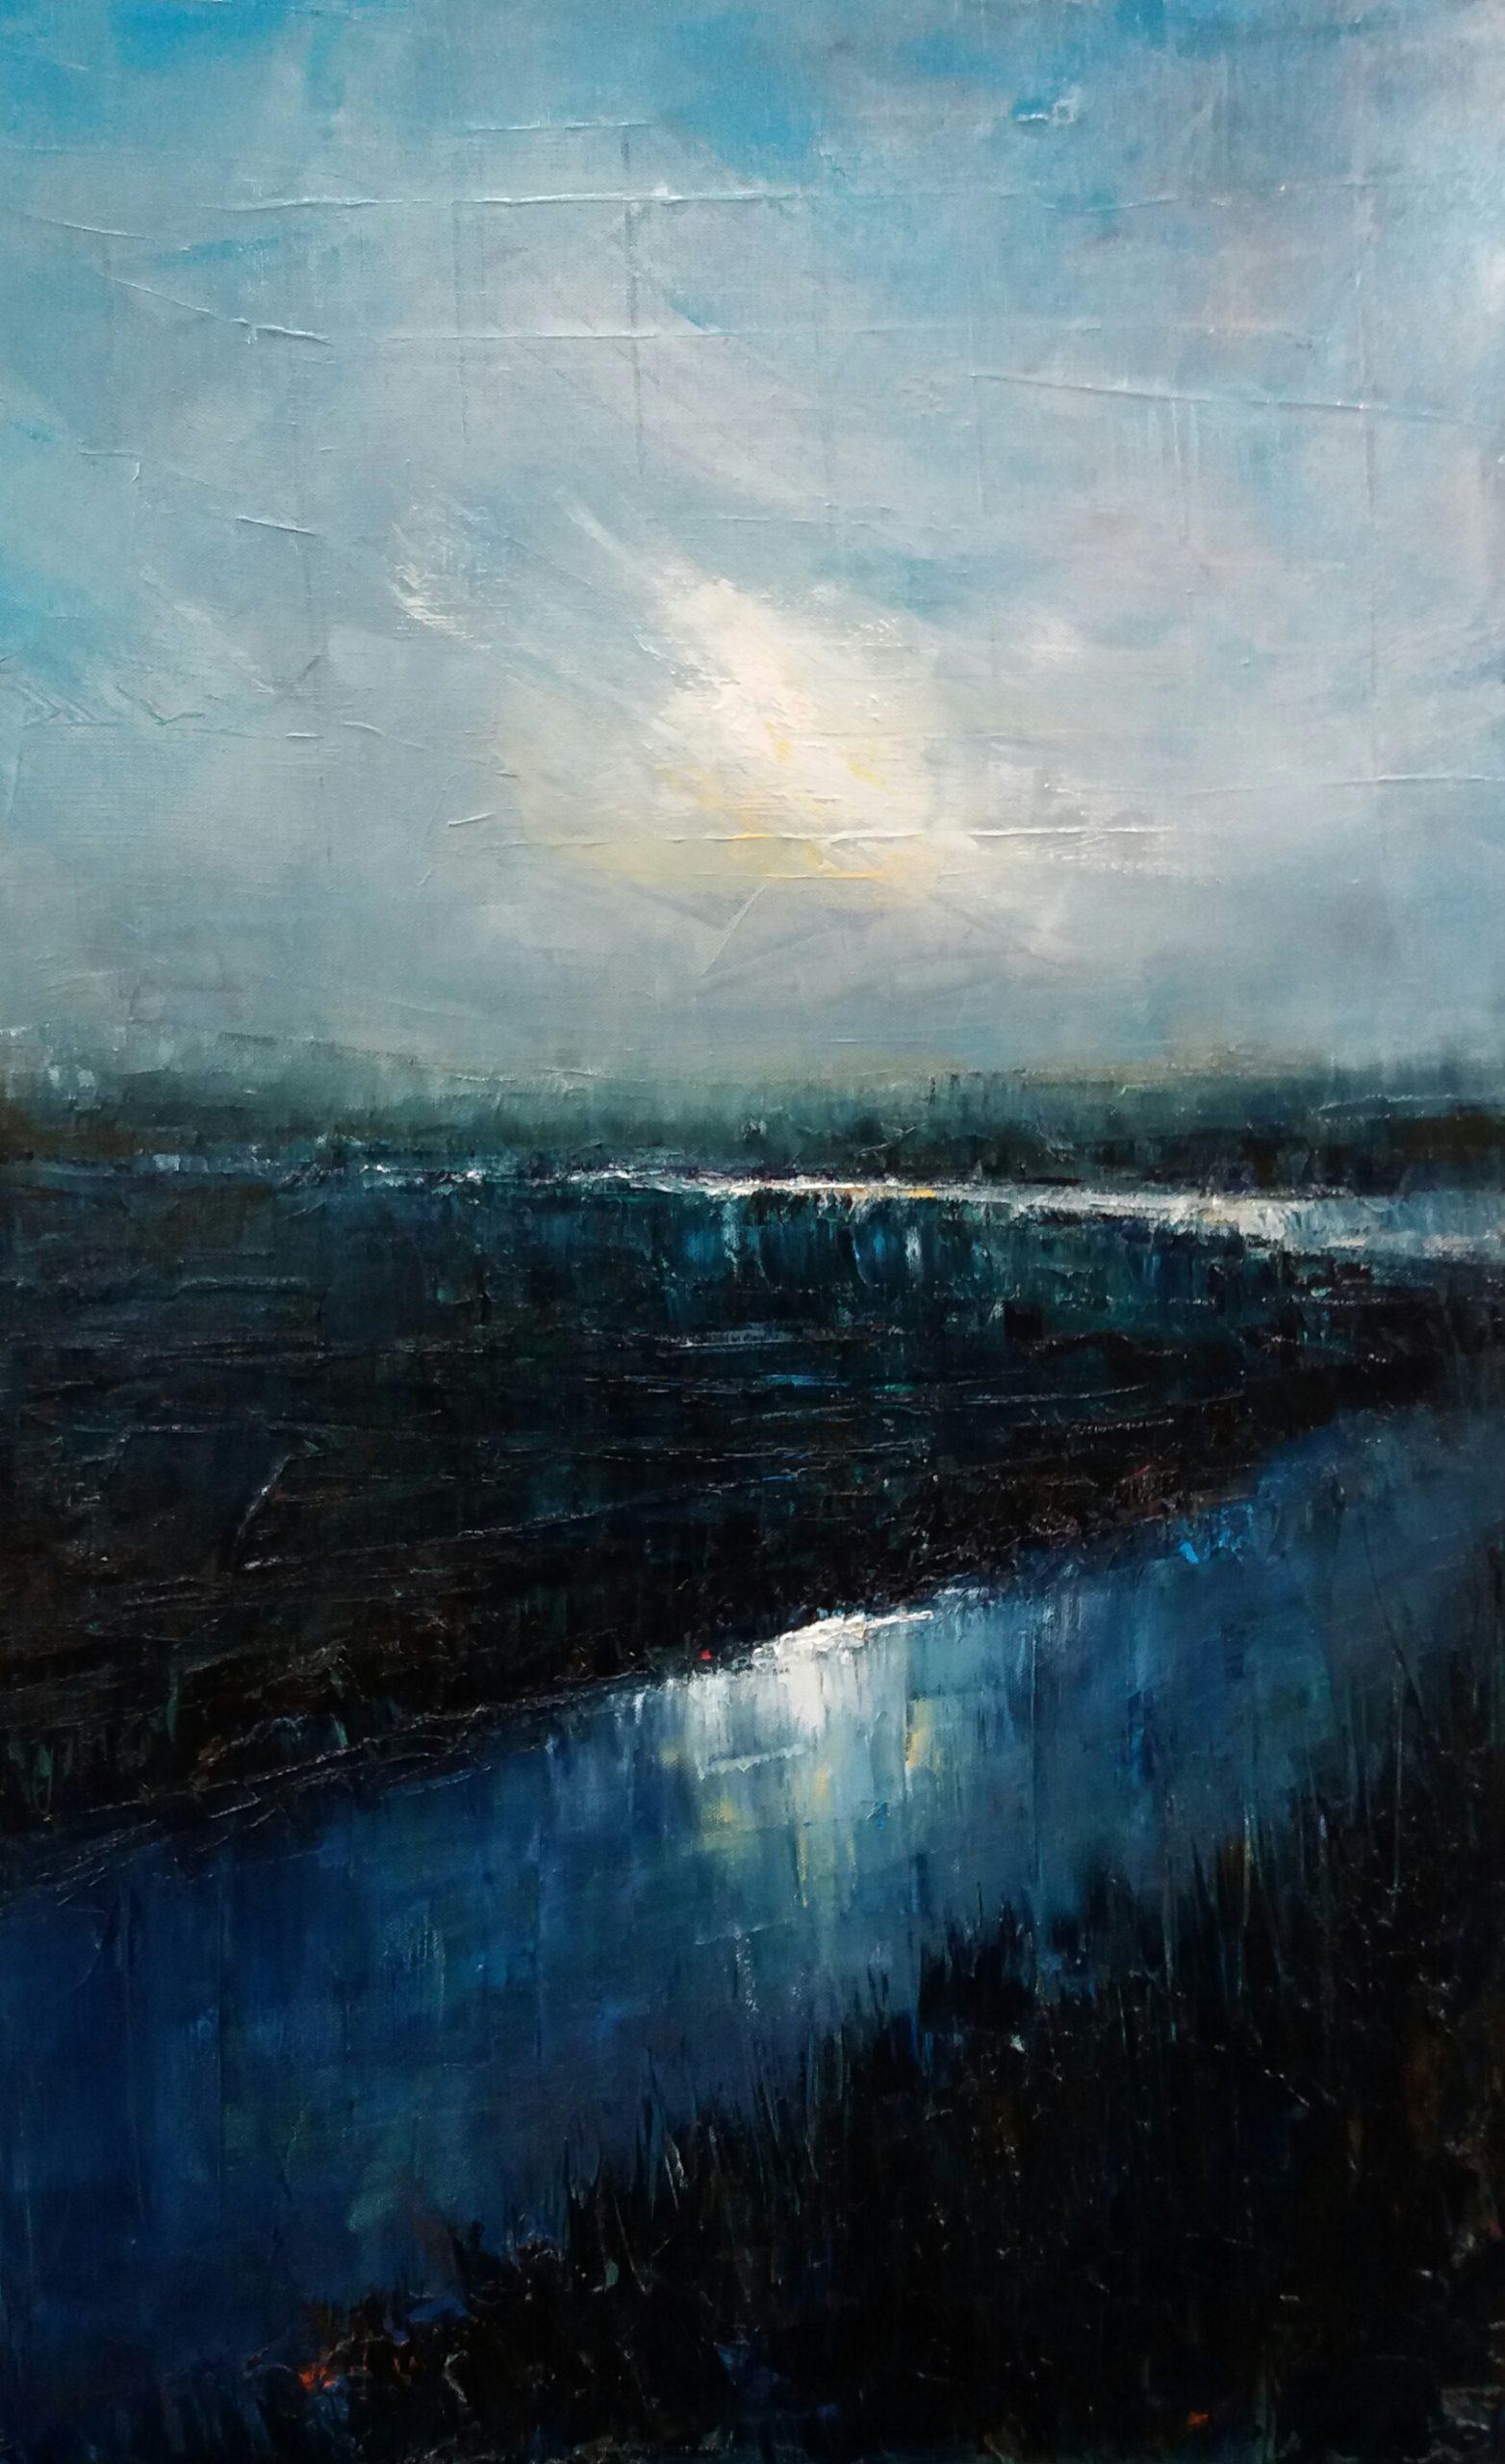 Winter Marshes. Oil on Canvas. 50/80cm. Oil Landscape painting, Geldeston. Waveney Valley. Beccles painter Artist